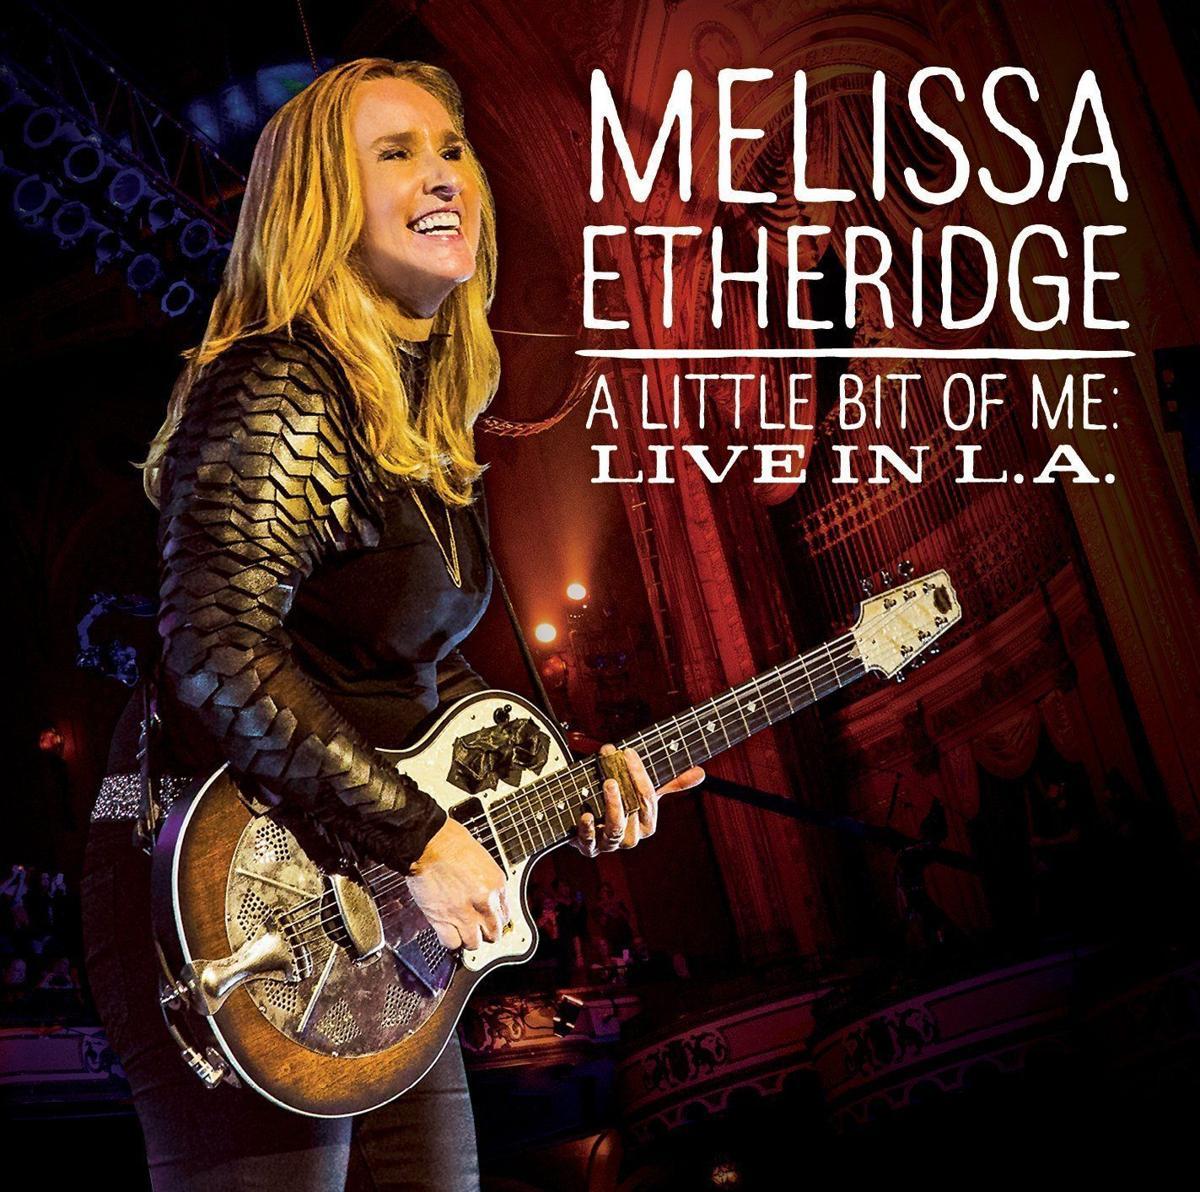 Review Melissa Etheridge A Little Bit Of Me Live In L